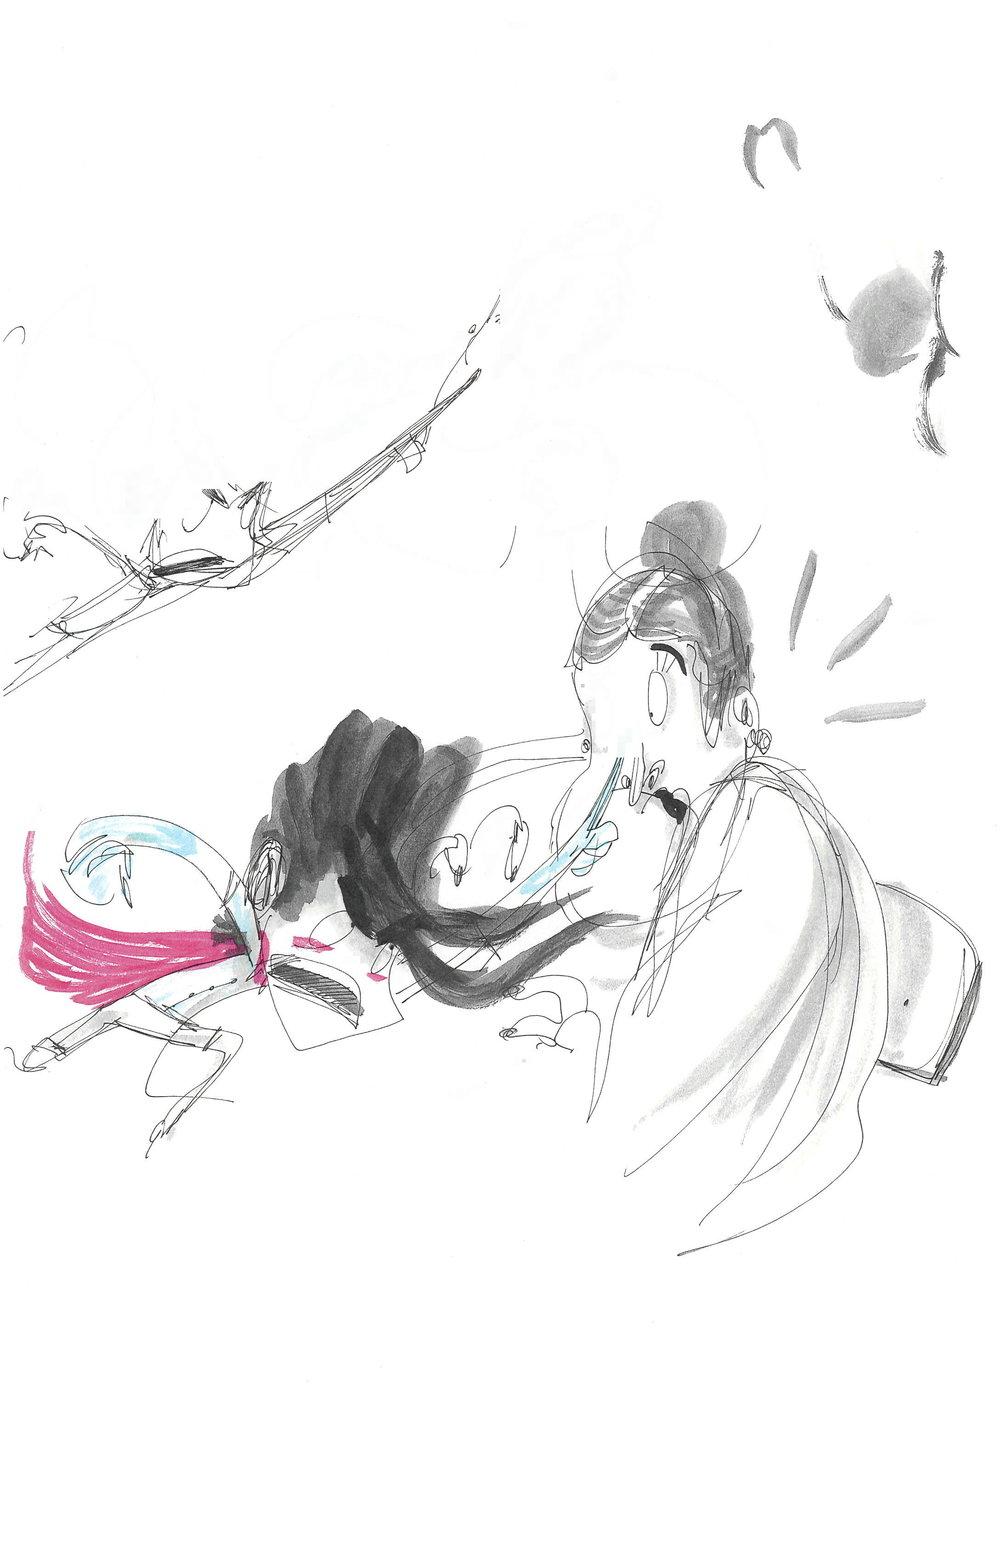 BRIANWONDERS-sketches-1_Page_16_Image_0001.jpg